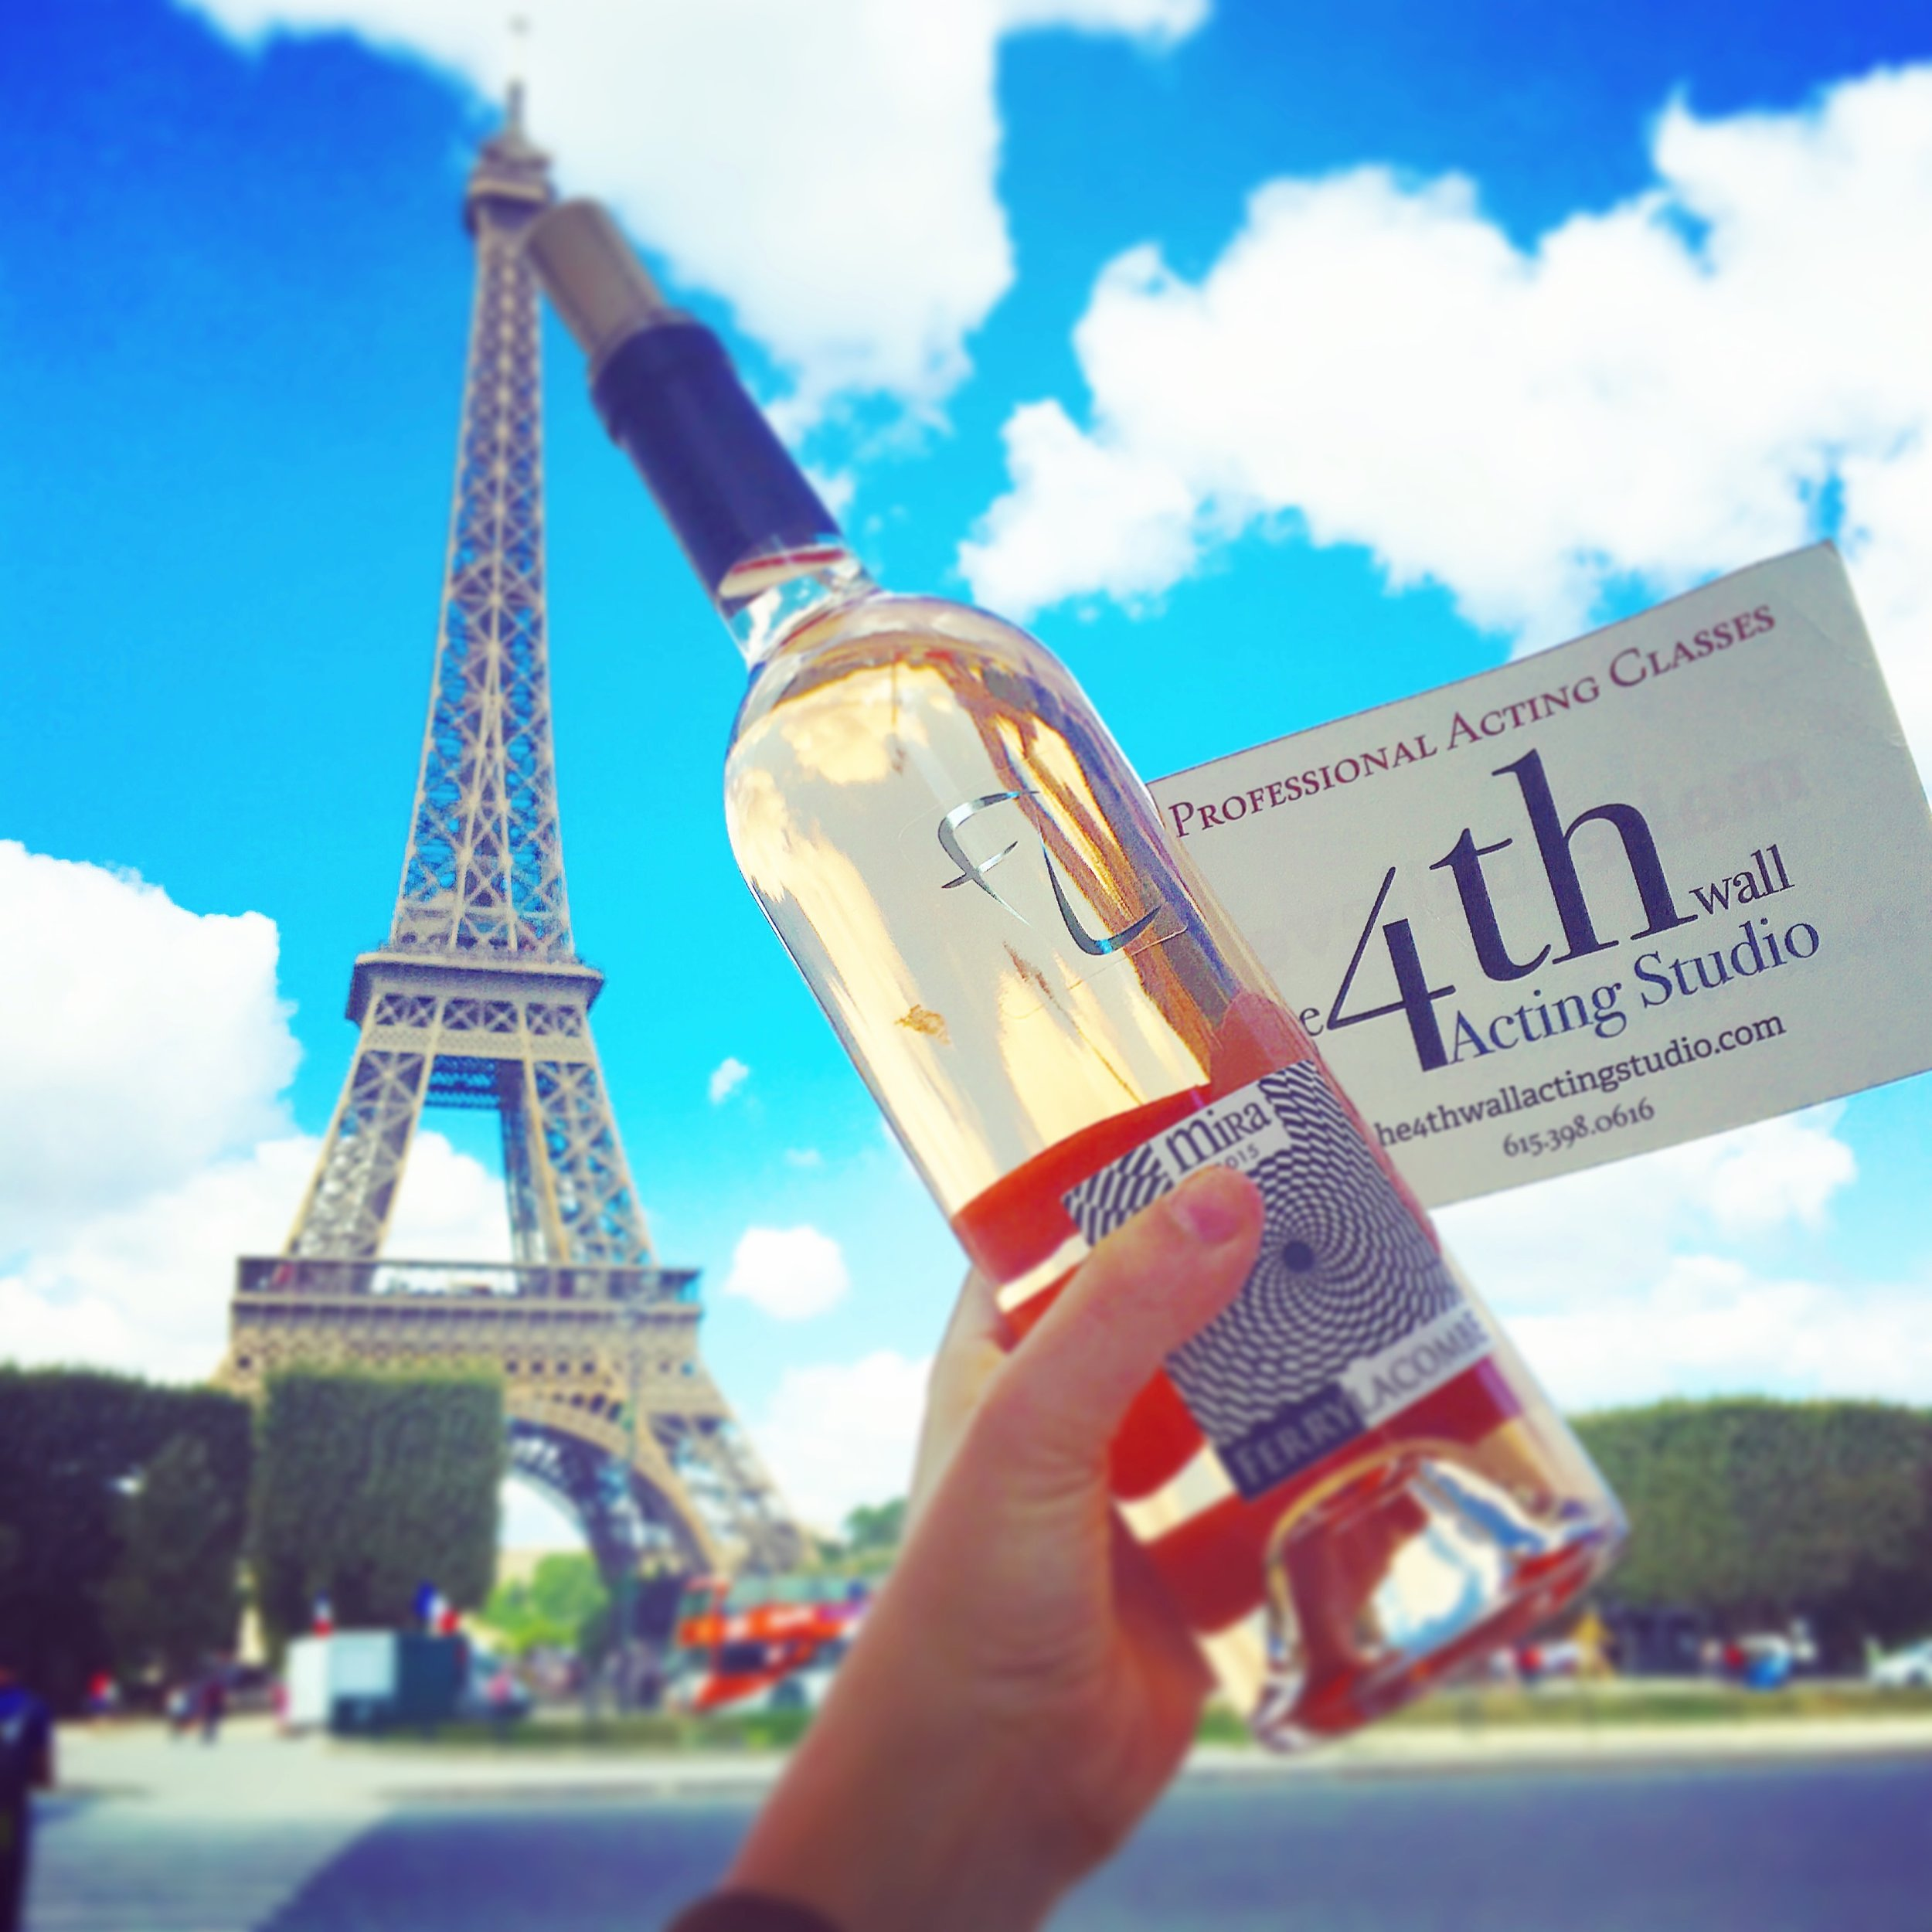 We made it to Paris!